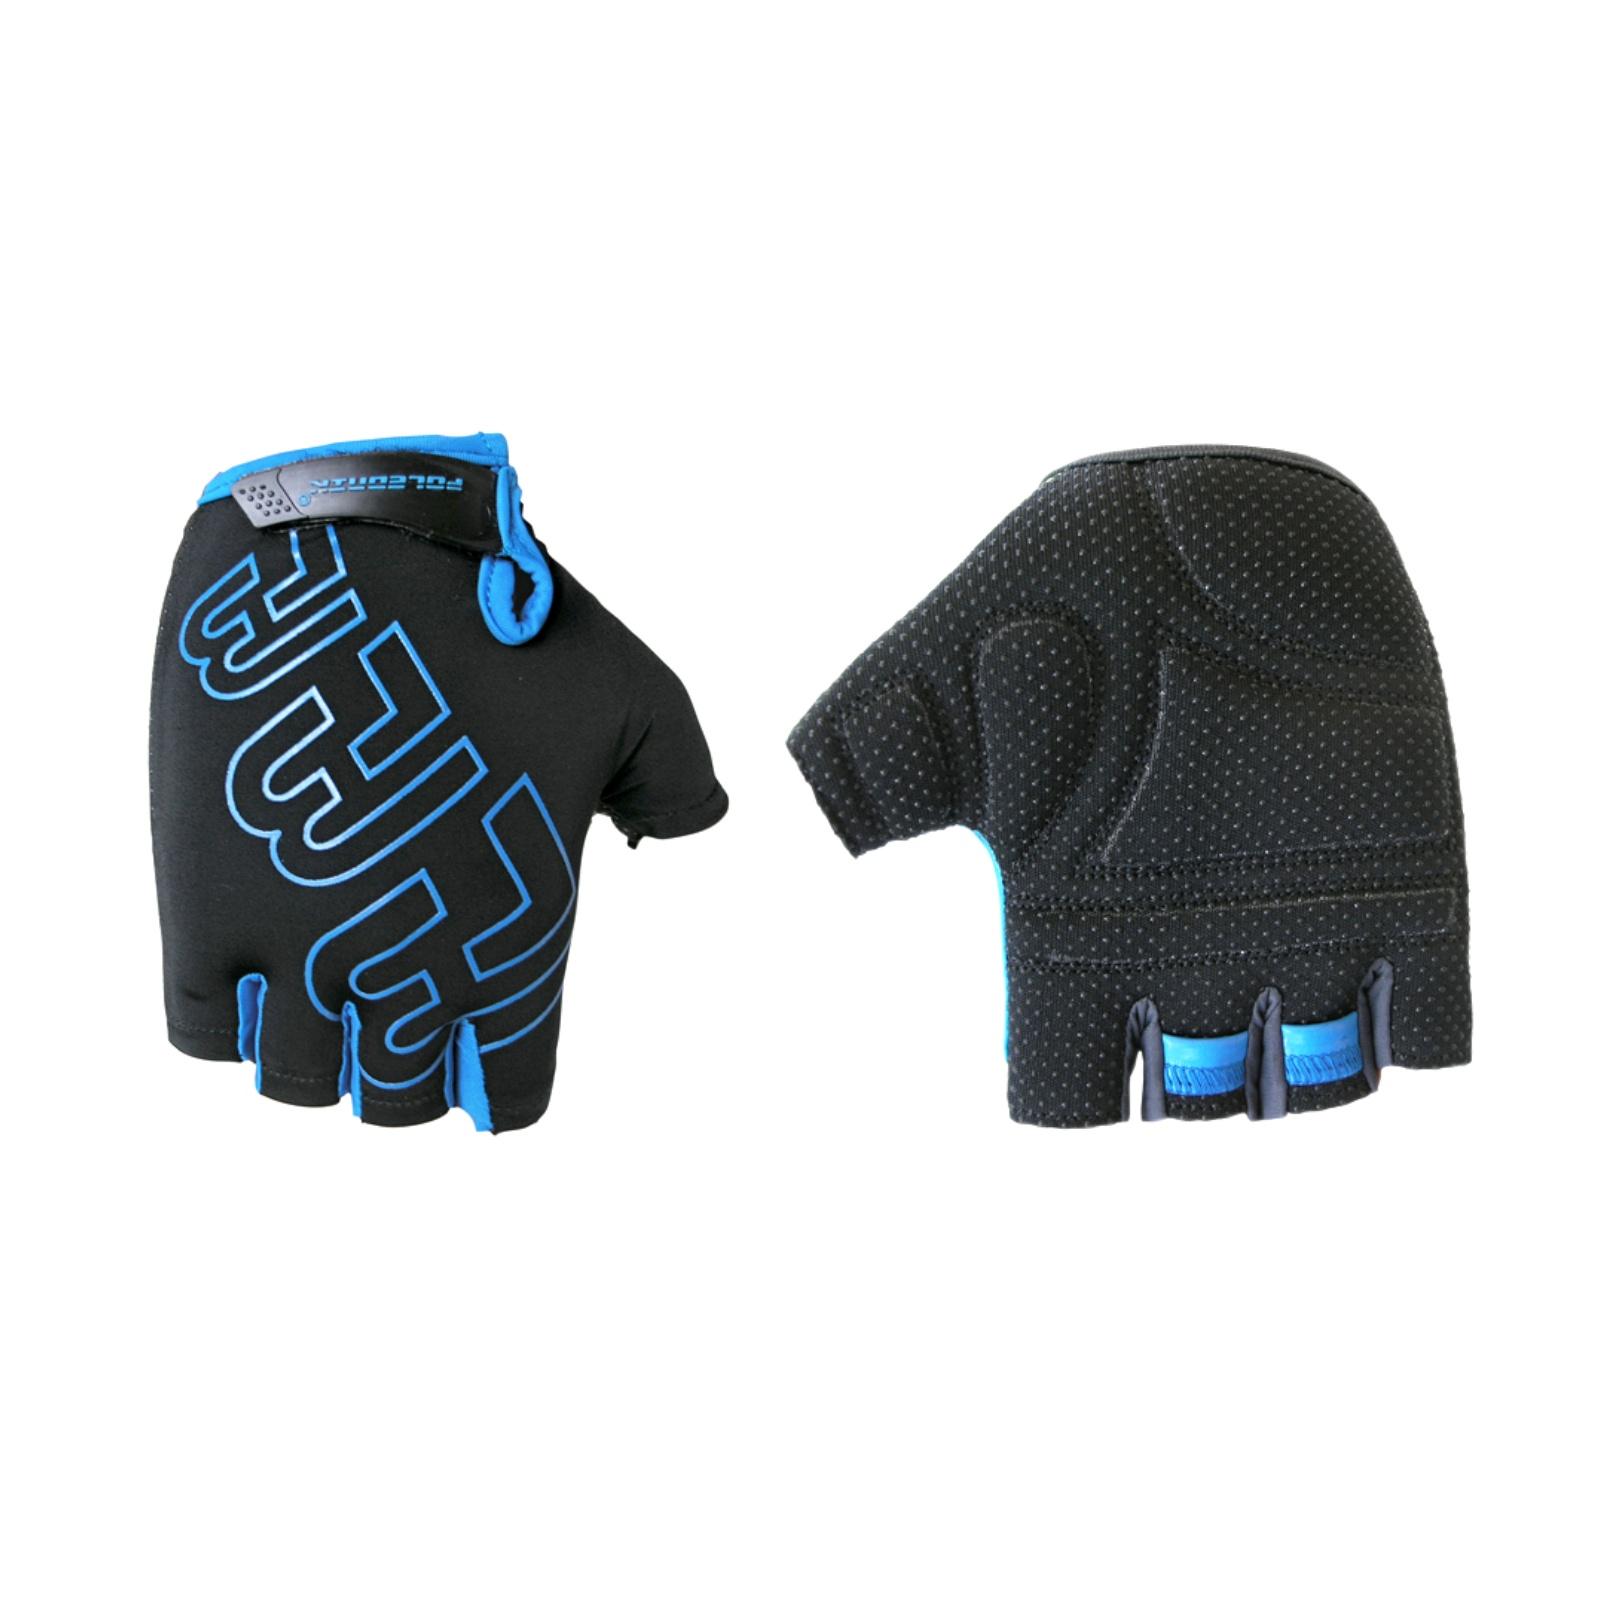 Cyklo rukavice POLEDNIK Pánske F3 čierno-modrá, veľ. M